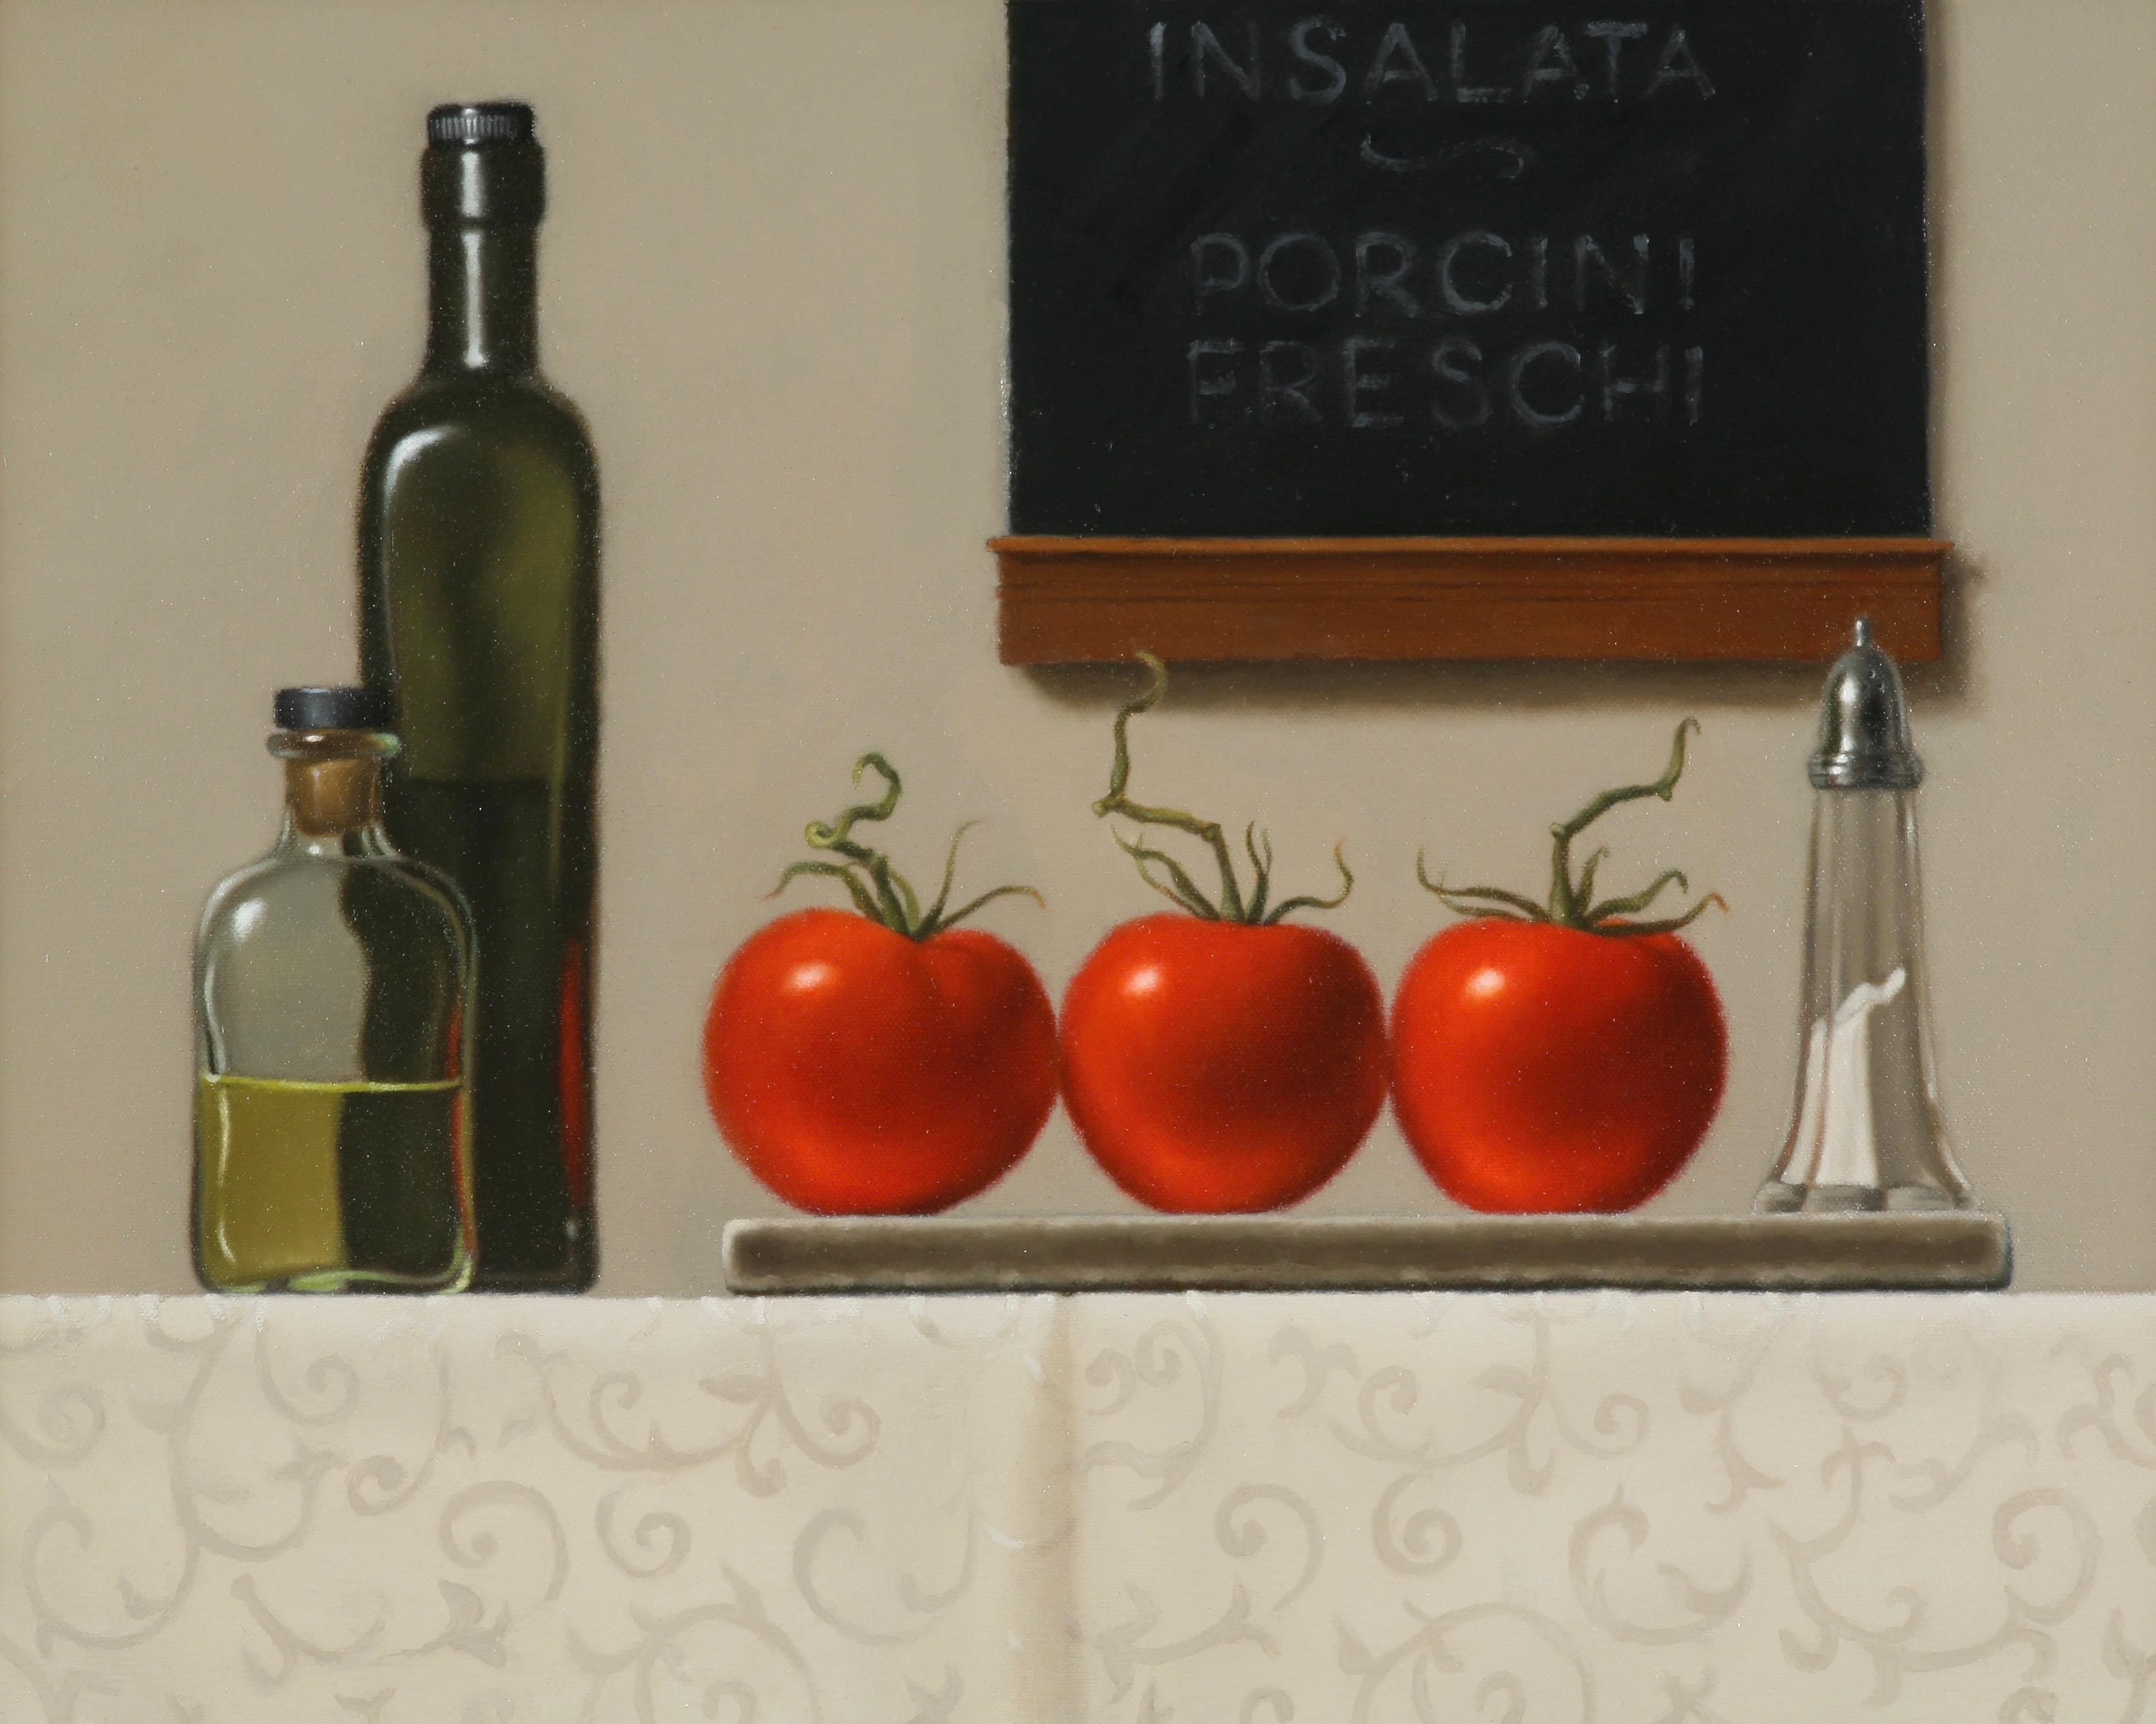 Insalata / realism still life oil tomatoes in kitchen